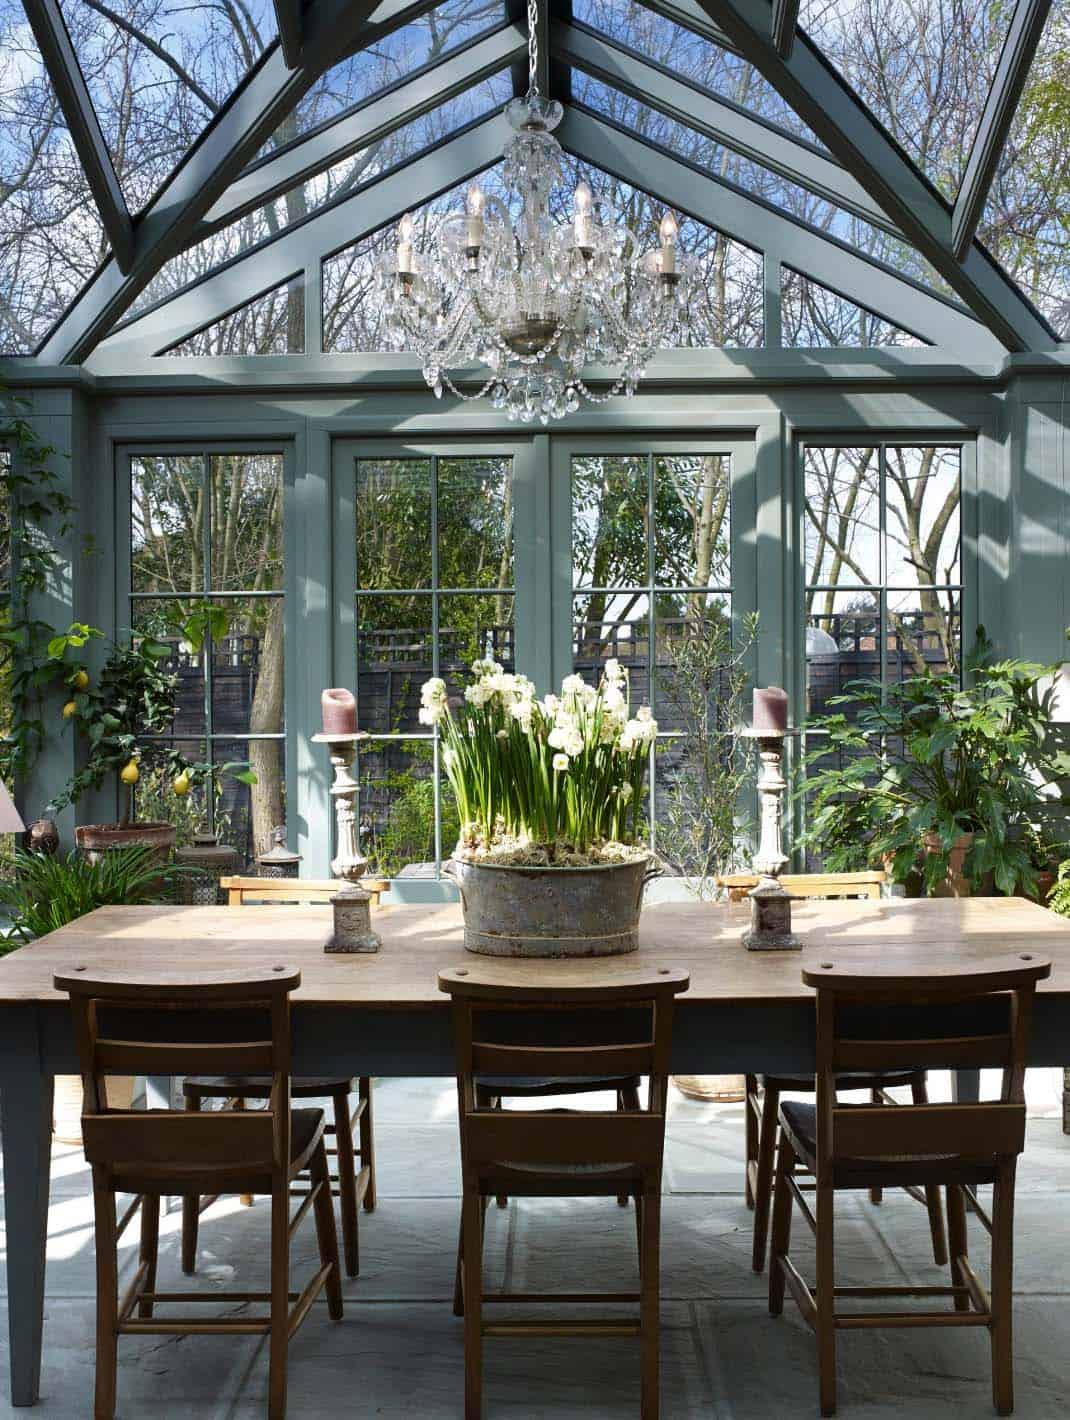 Amazing-Conservatory-Greenhouse-Ideas-09-1-Kindesign